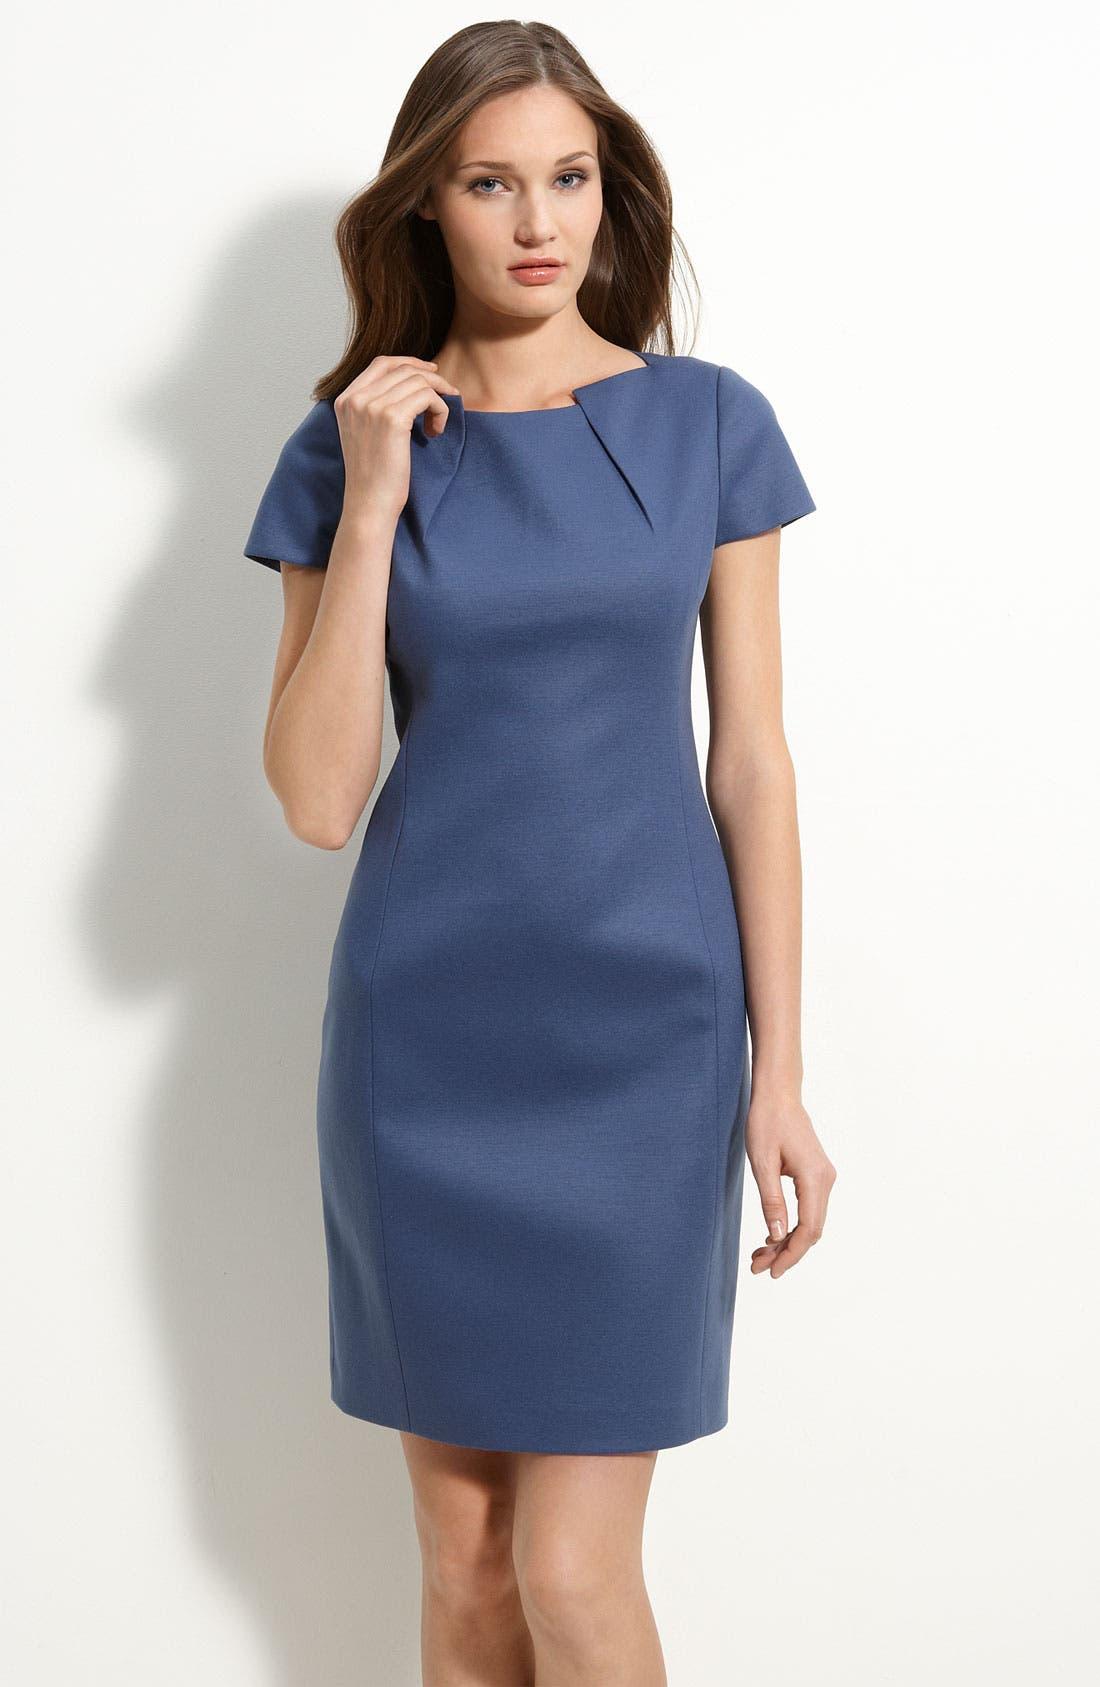 Alternate Image 1 Selected - Elie Tahari 'Alexandria' Wool Blend Sheath Dress